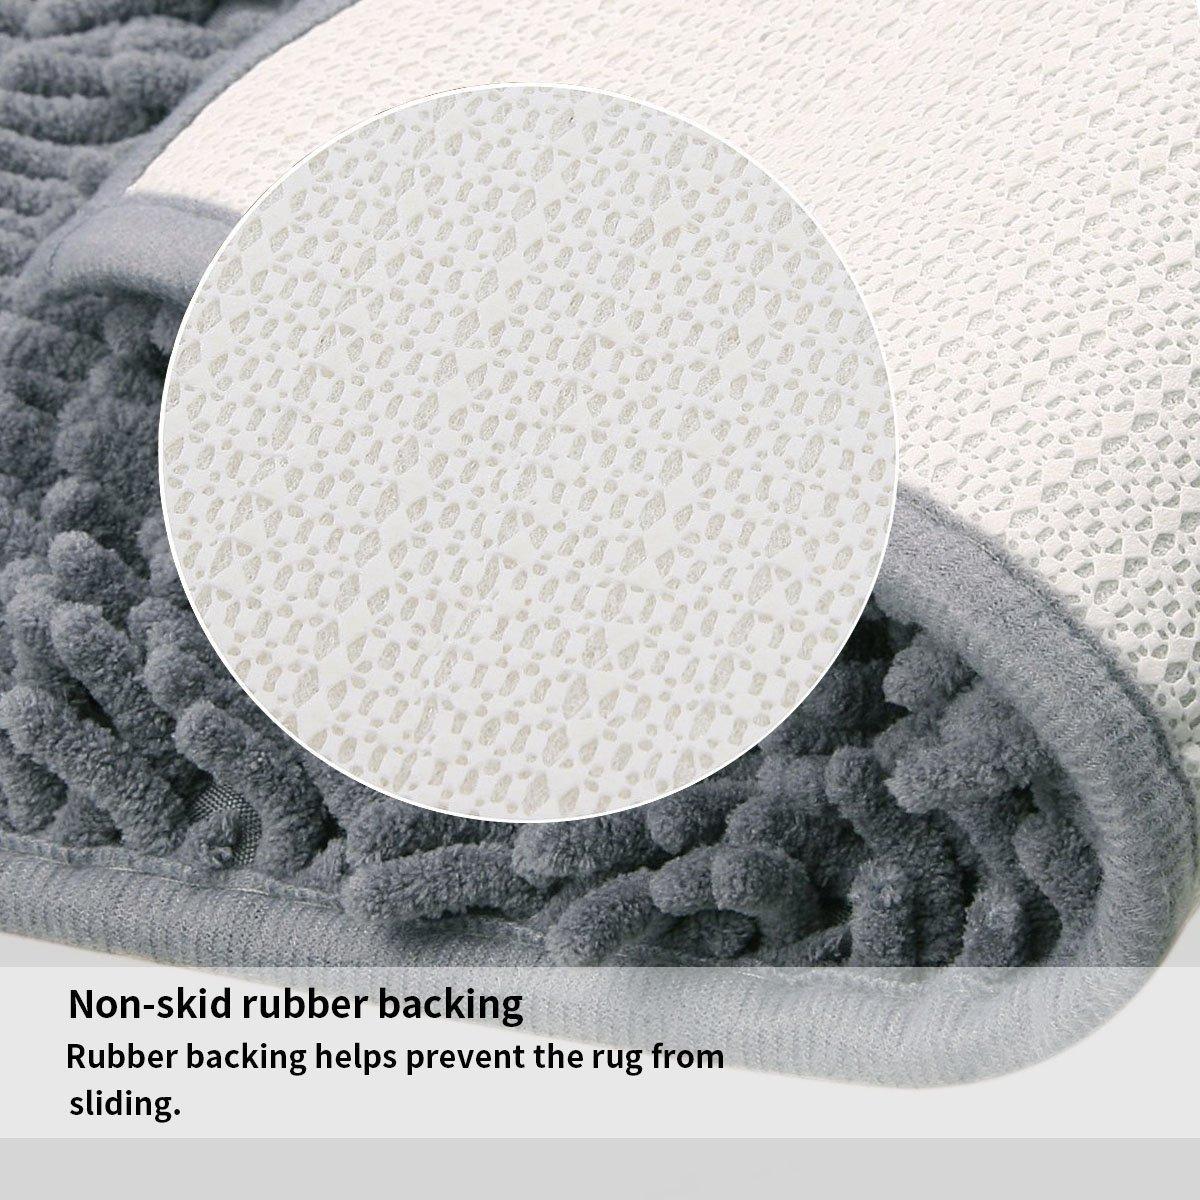 Bathroom rugs with rubber backing - Amazon Com Vdomus Microfiber Bathroom Contour Rugs Combo Set Of 2 Soft Shaggy Non Slip Bath Shower Mat And U Shaped Toilet Floor Rug Dark Gray Home